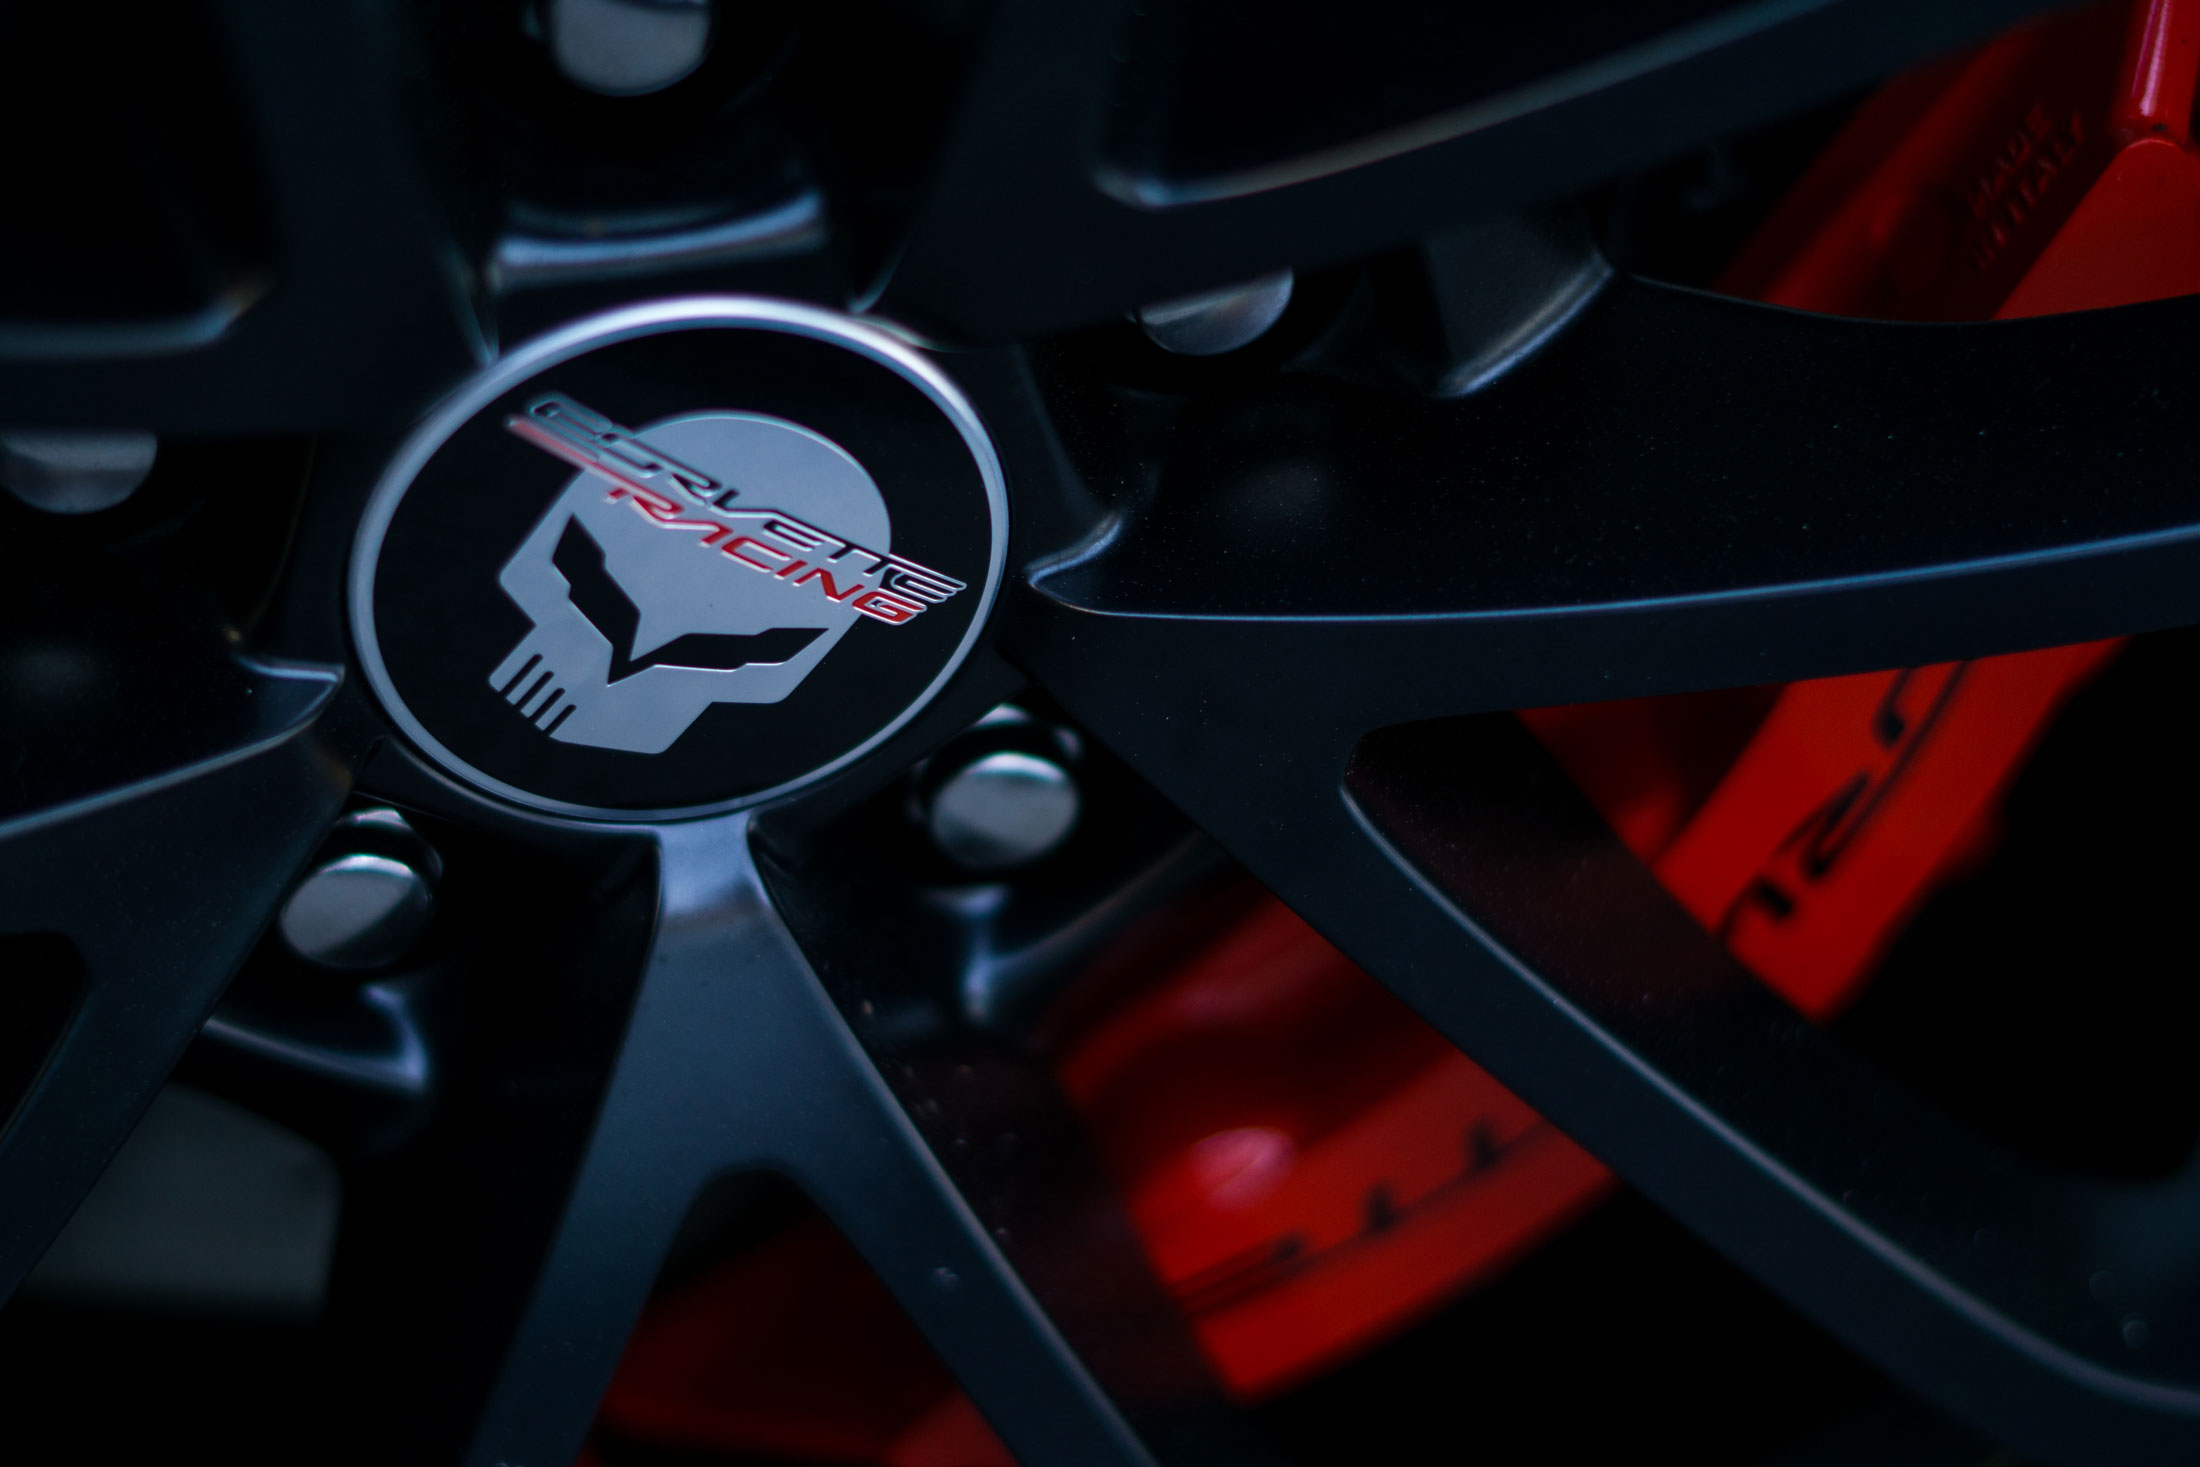 Corvette racing wheel detail